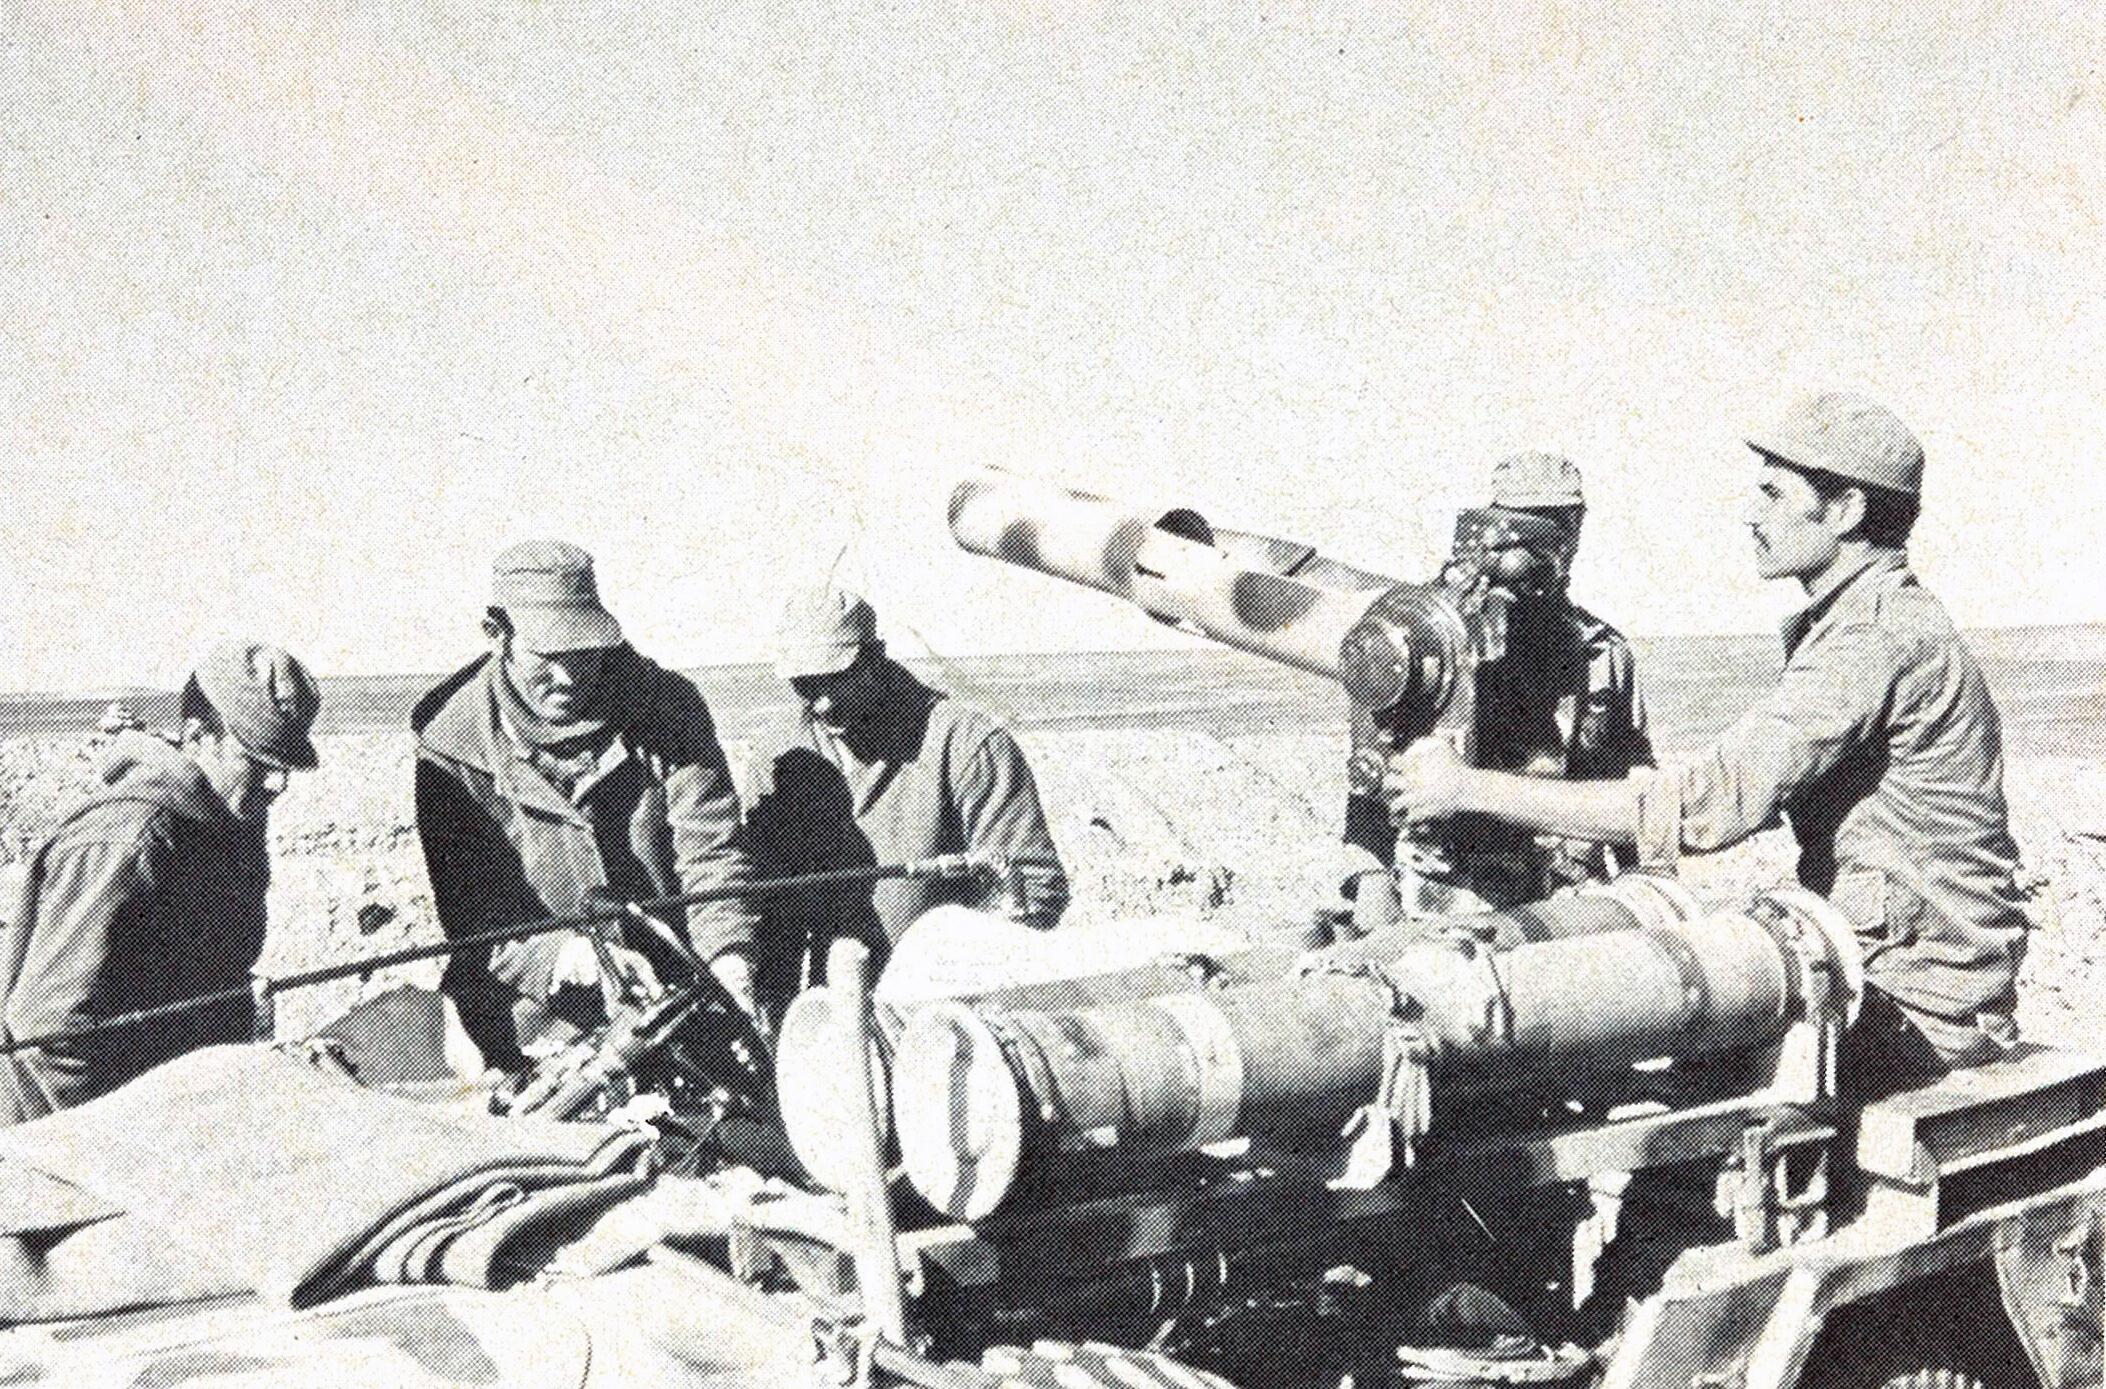 Le conflit armé du sahara marocain - Page 9 22788514608_e3dc7db42e_o